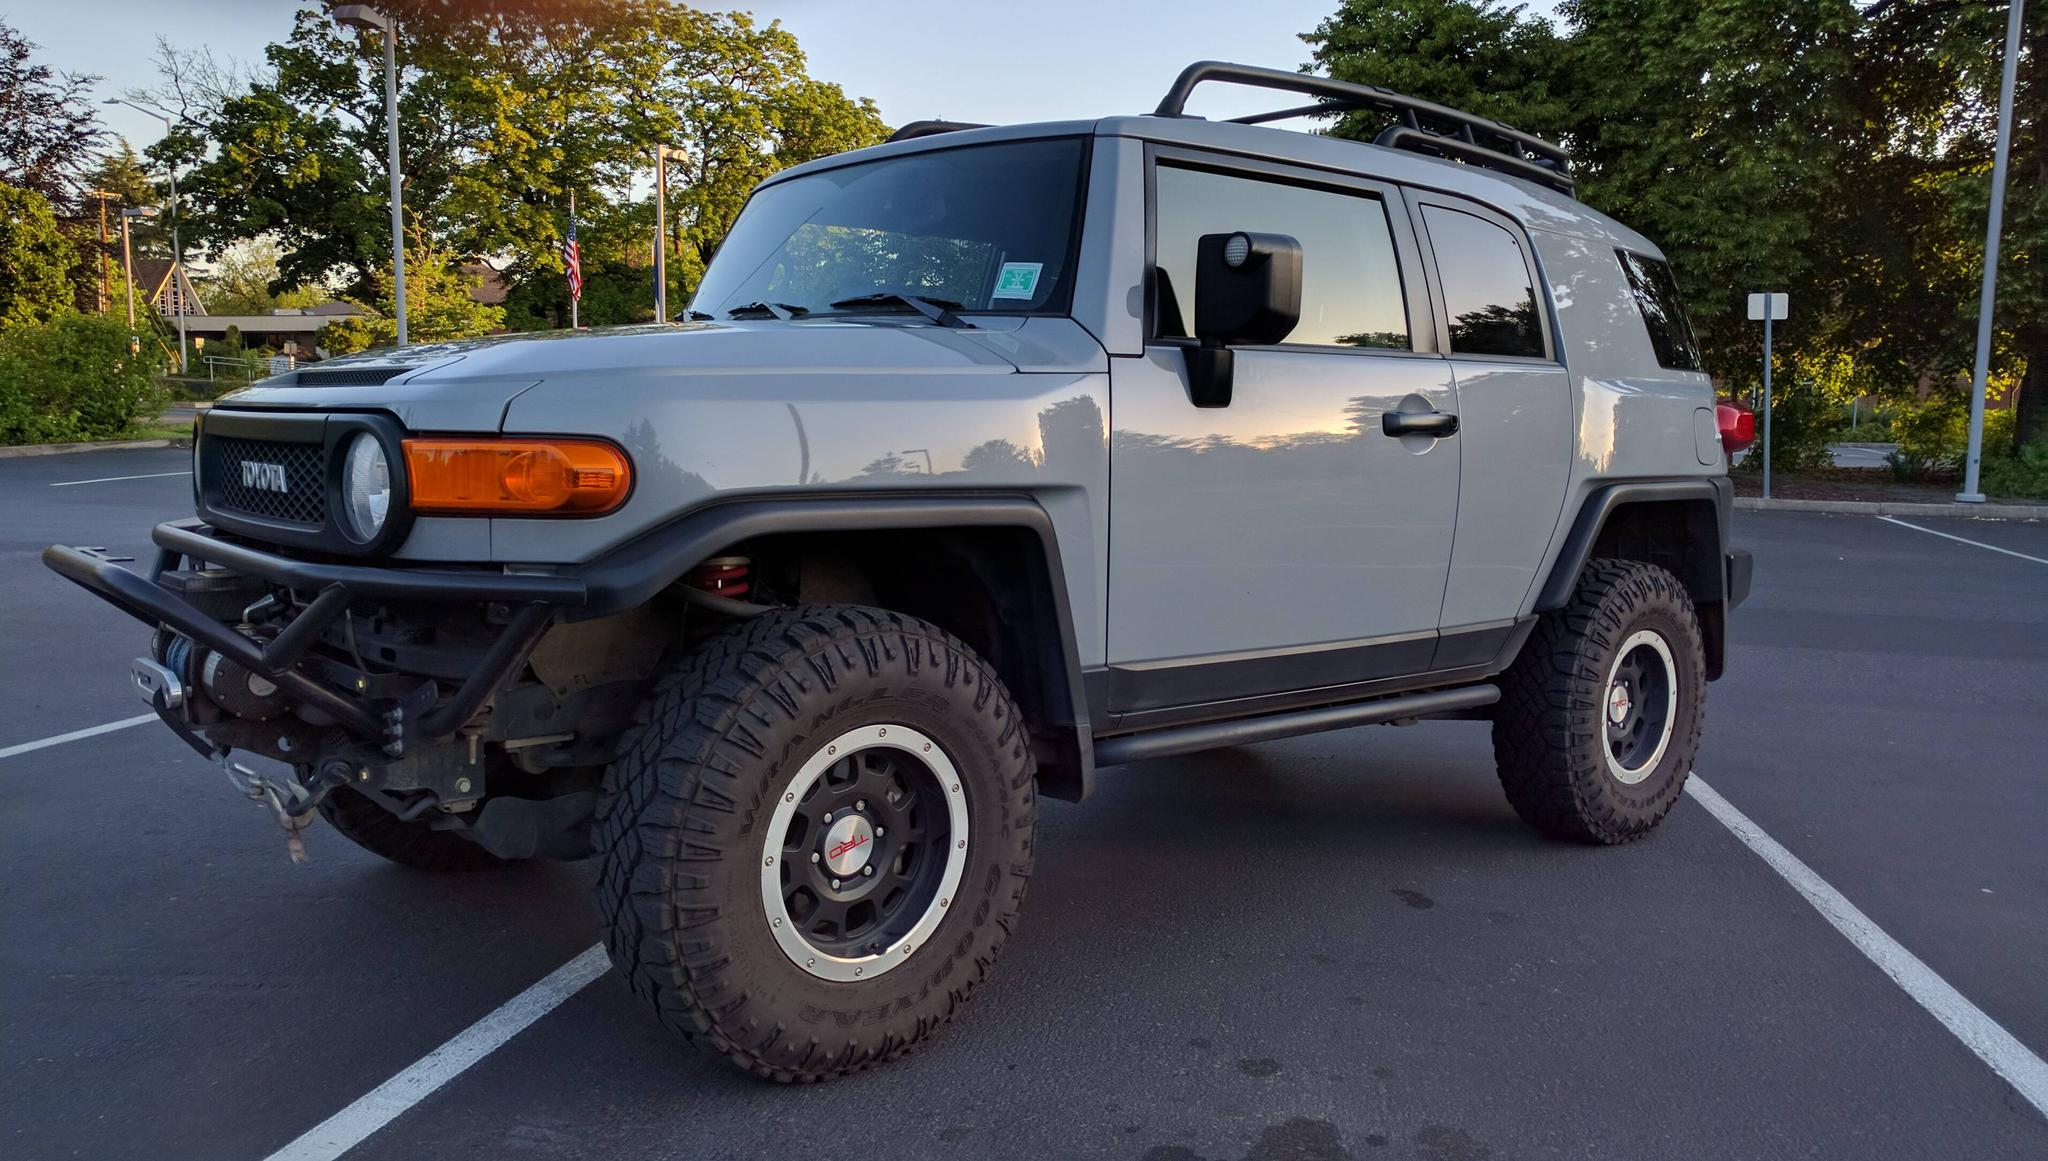 fj cruiser manual transmission review